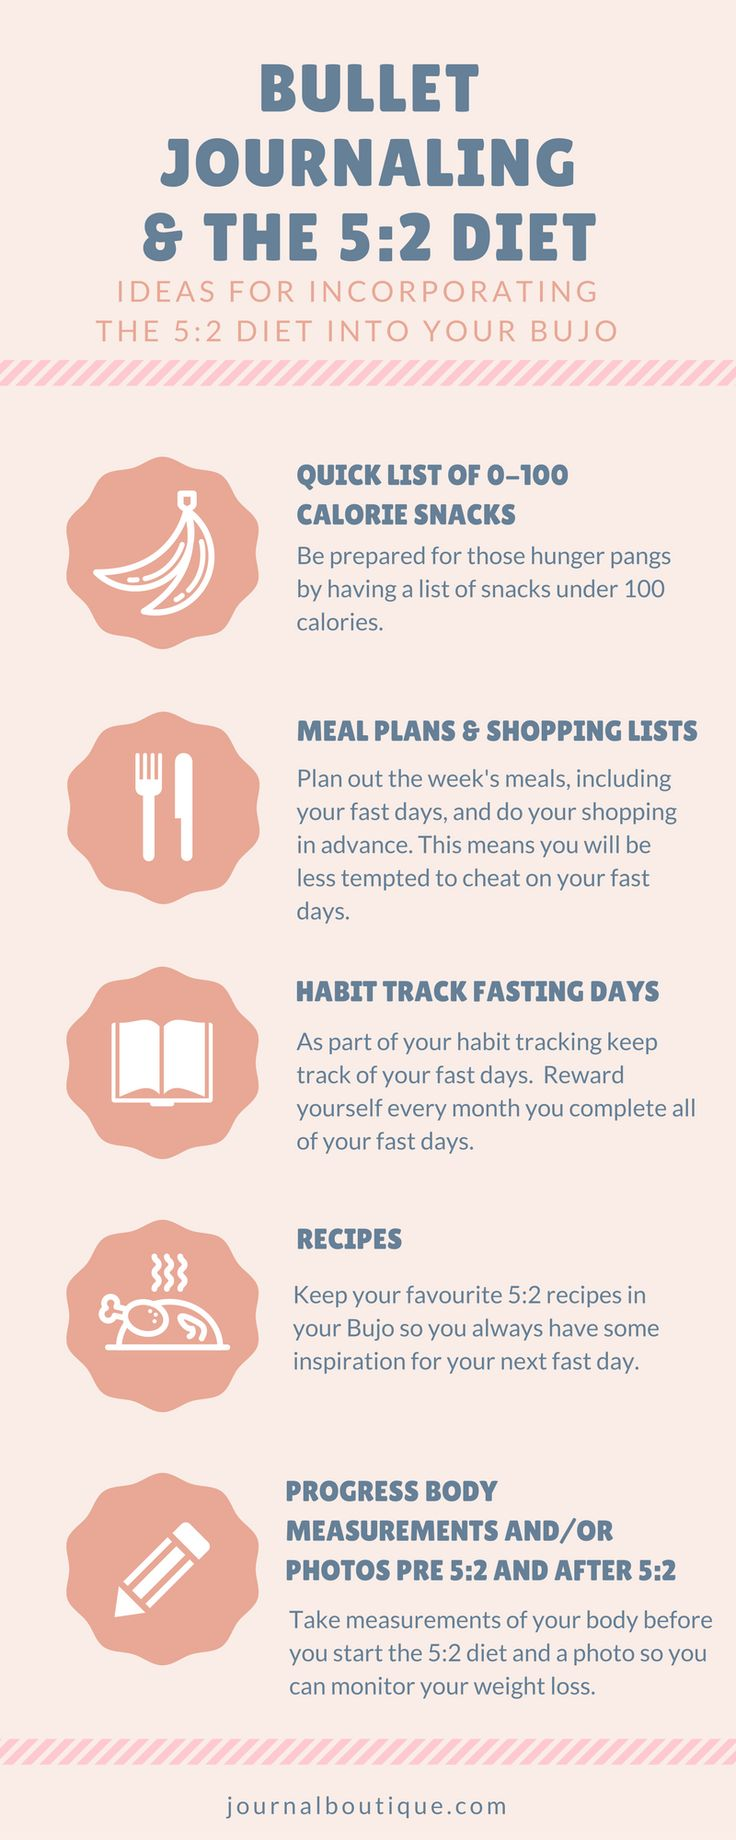 Incorporating 5:2 diet into your Bullet Journal #5:2diet #5:2 #fastdiet #bujo #bulletjournal #journalboutique